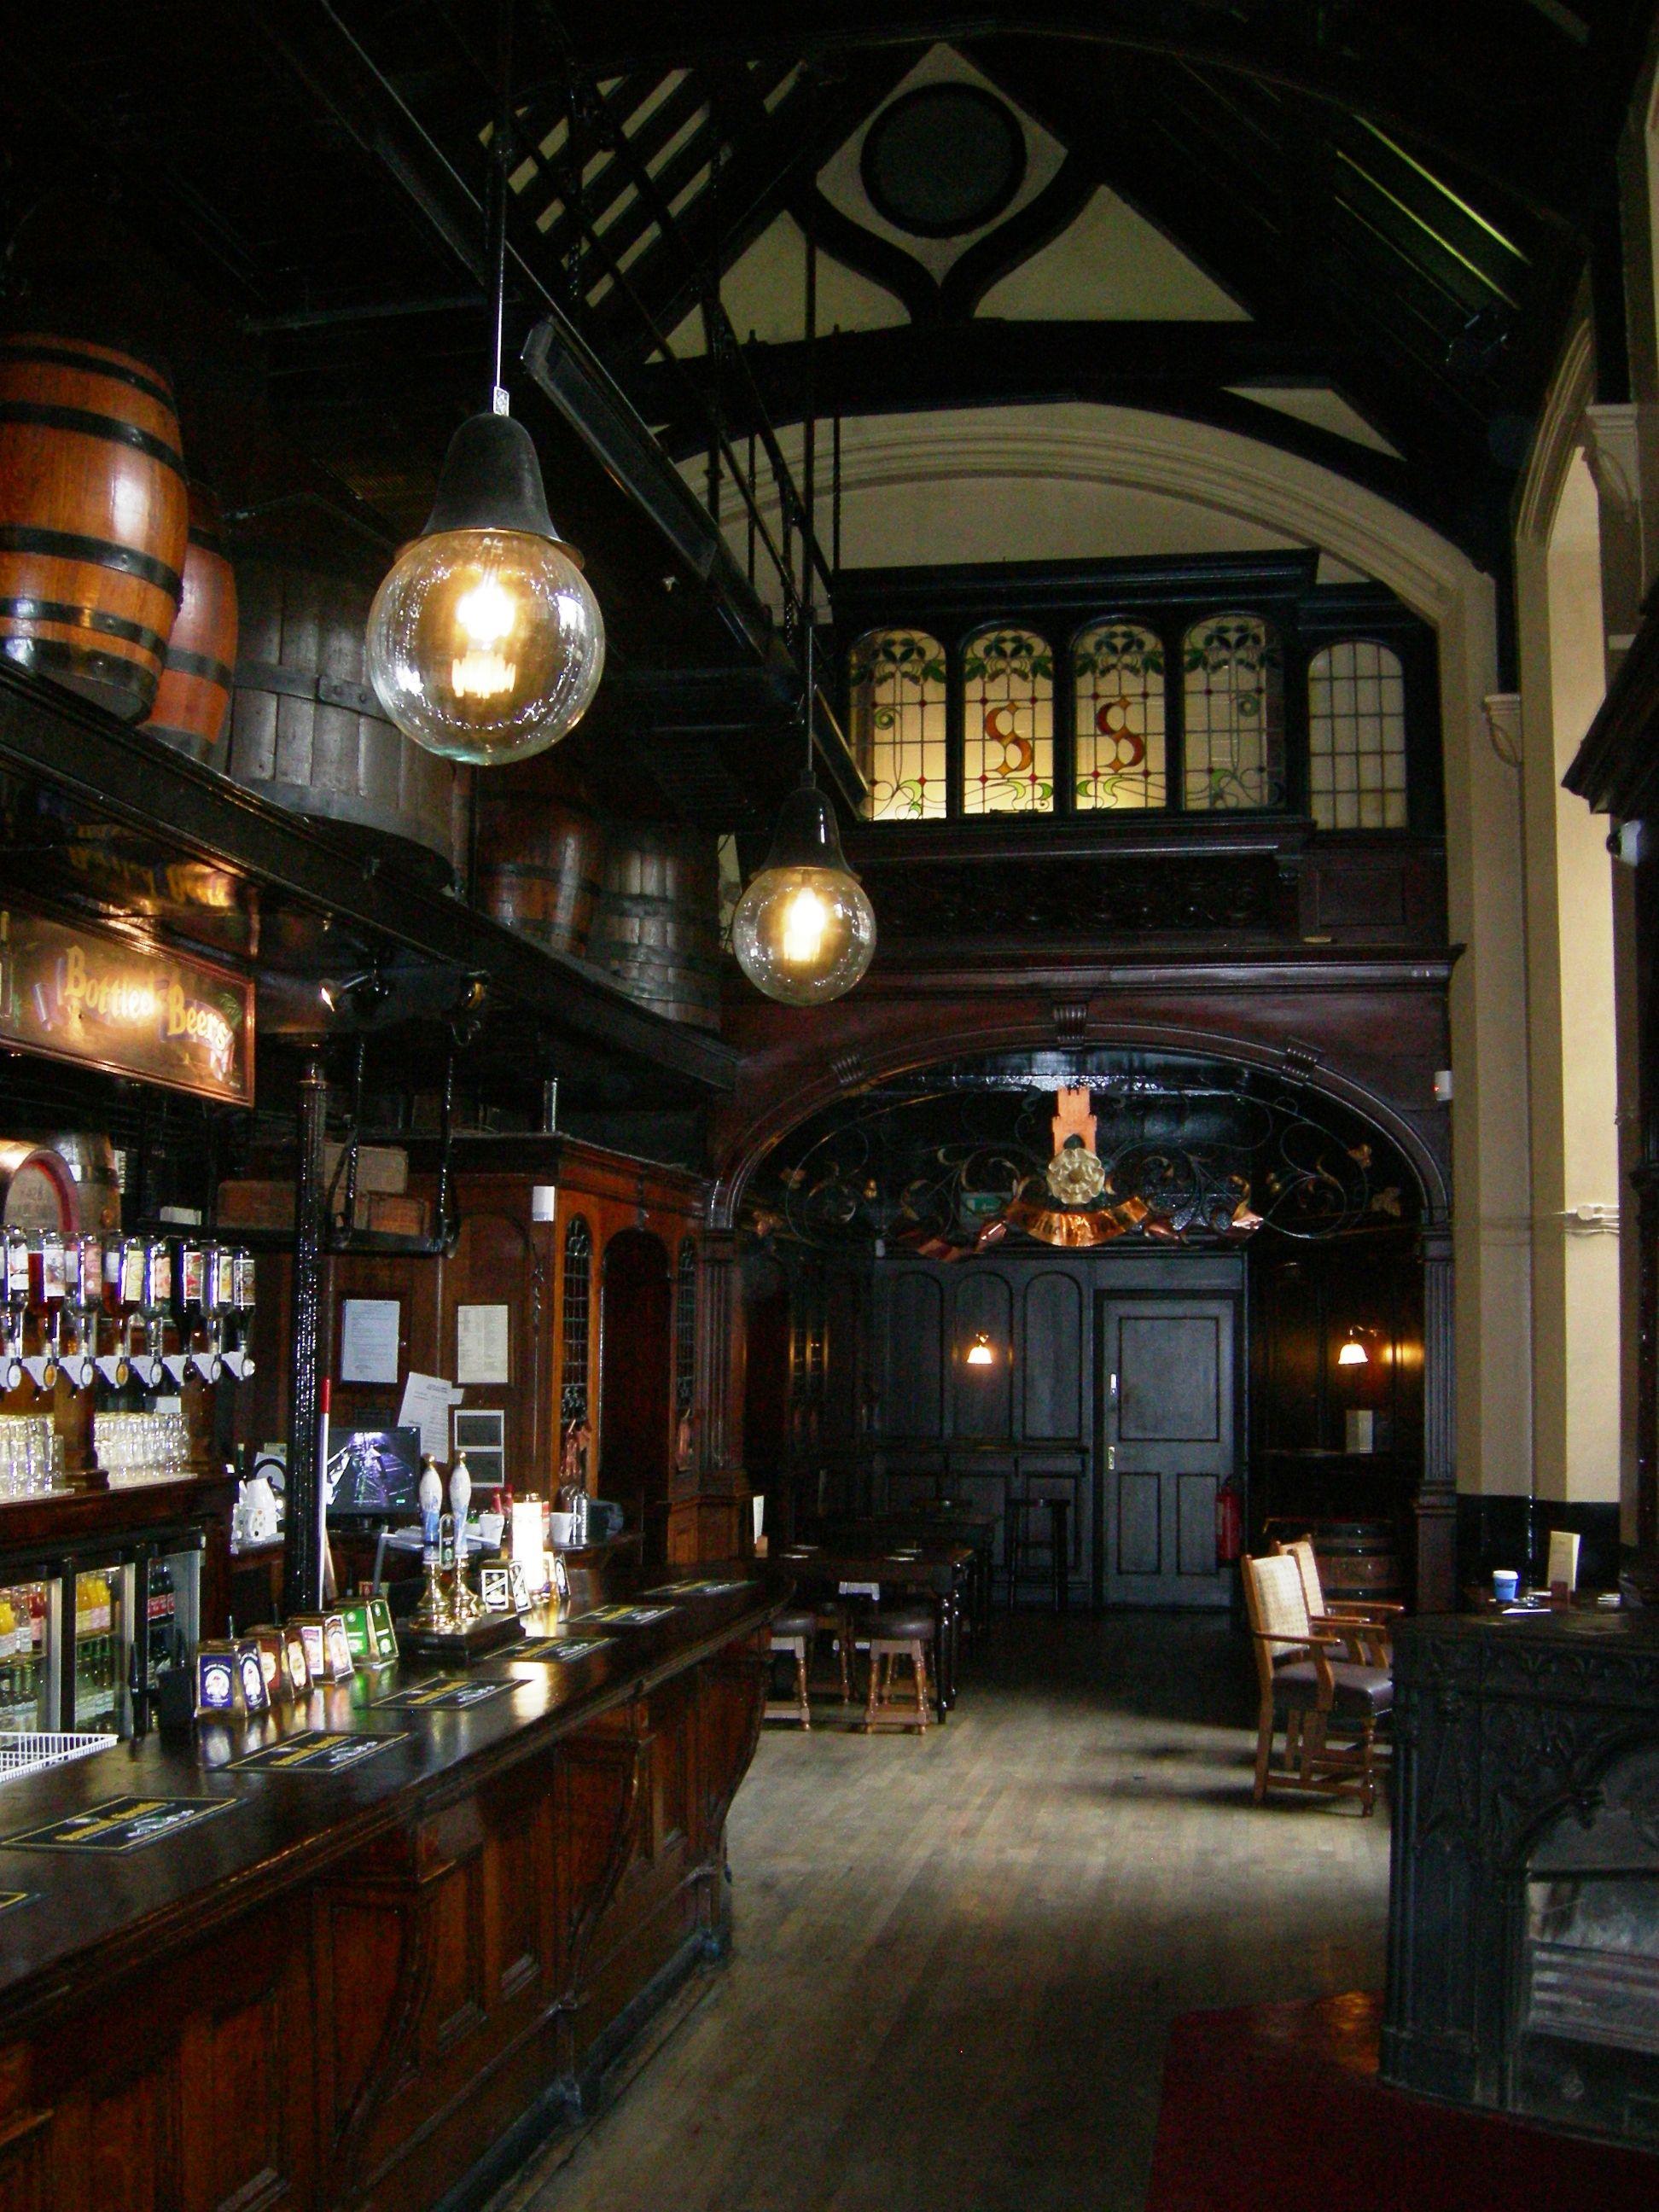 Best 25 British Pub Ideas On Pinterest Kensington London London Pubs And Time In London England